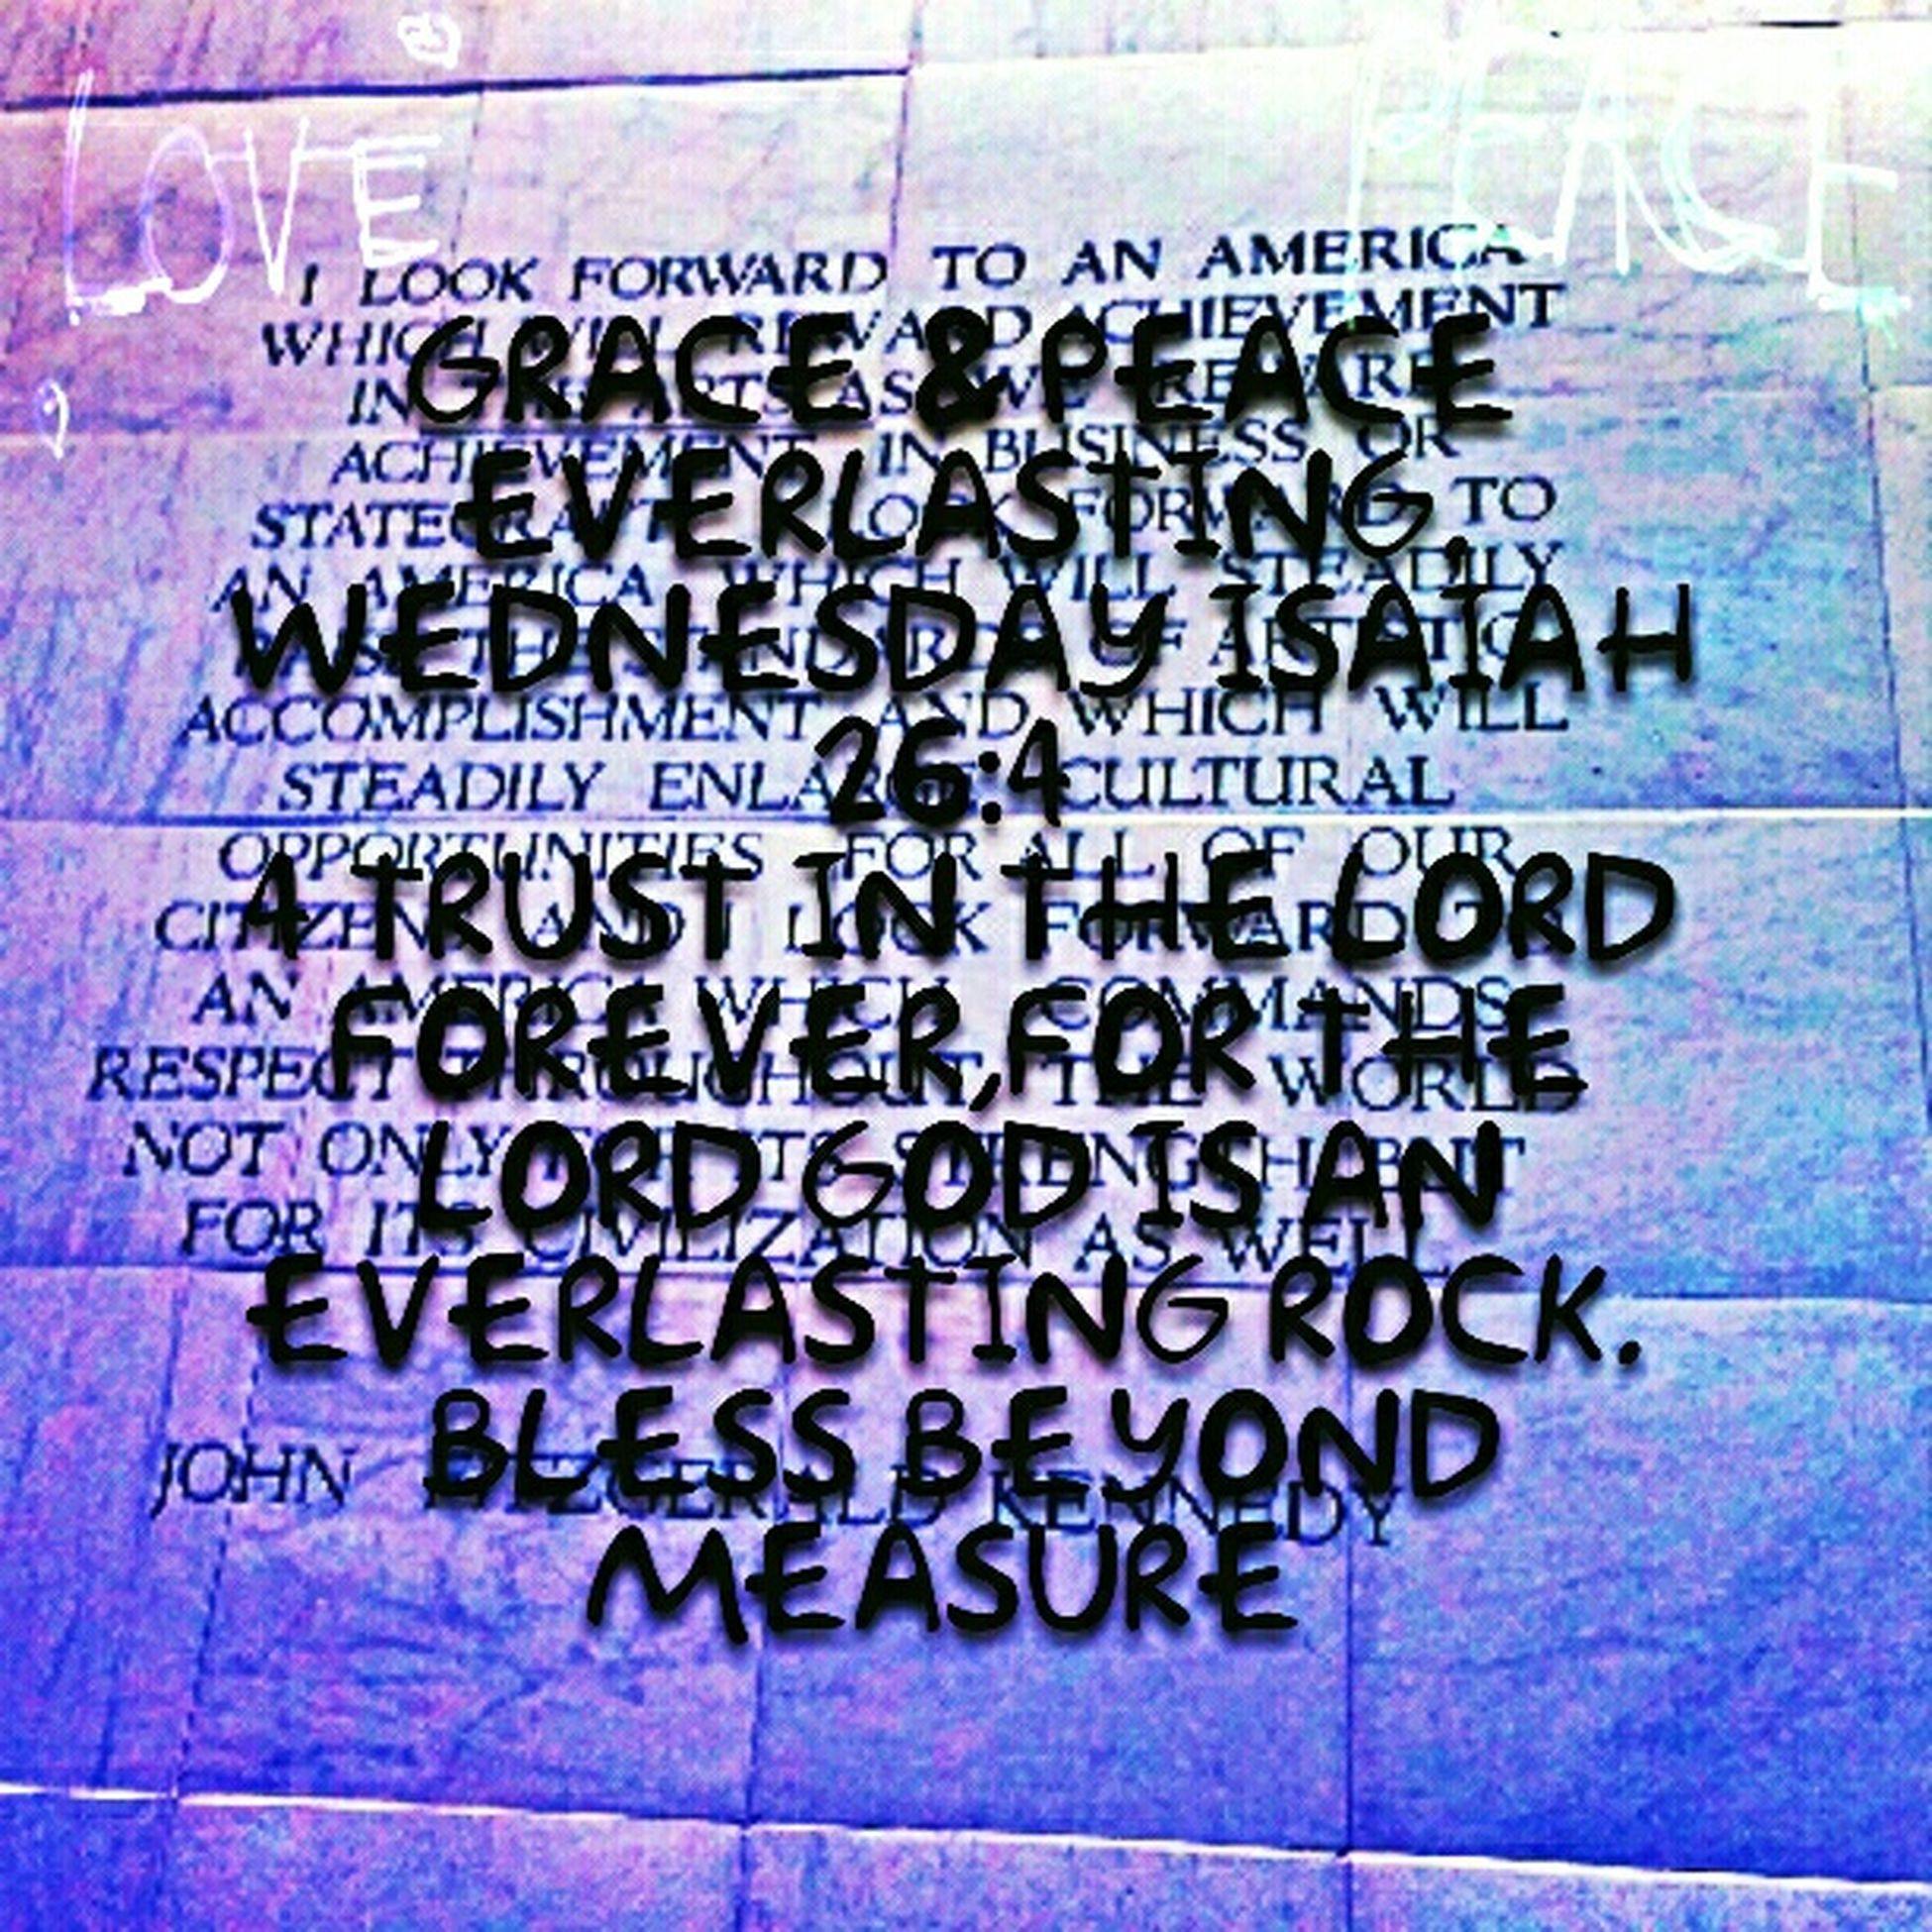 Grace & Peace Everlasting Wednesday